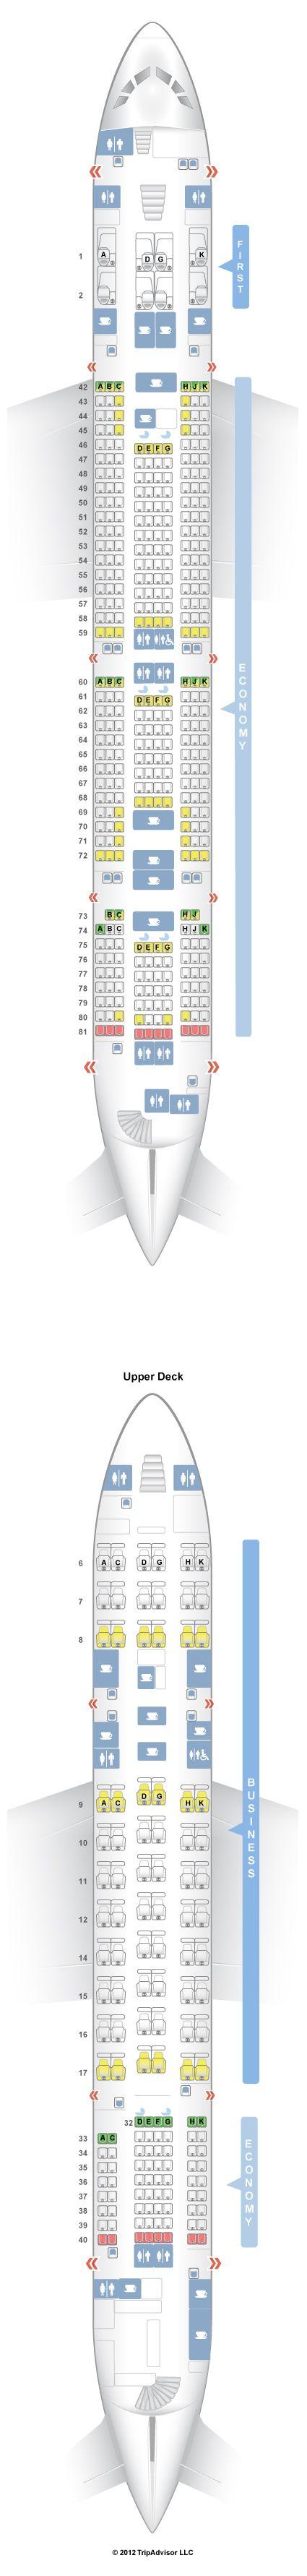 SeatGuru Seat Map Malaysia Airlines Airbus A380800